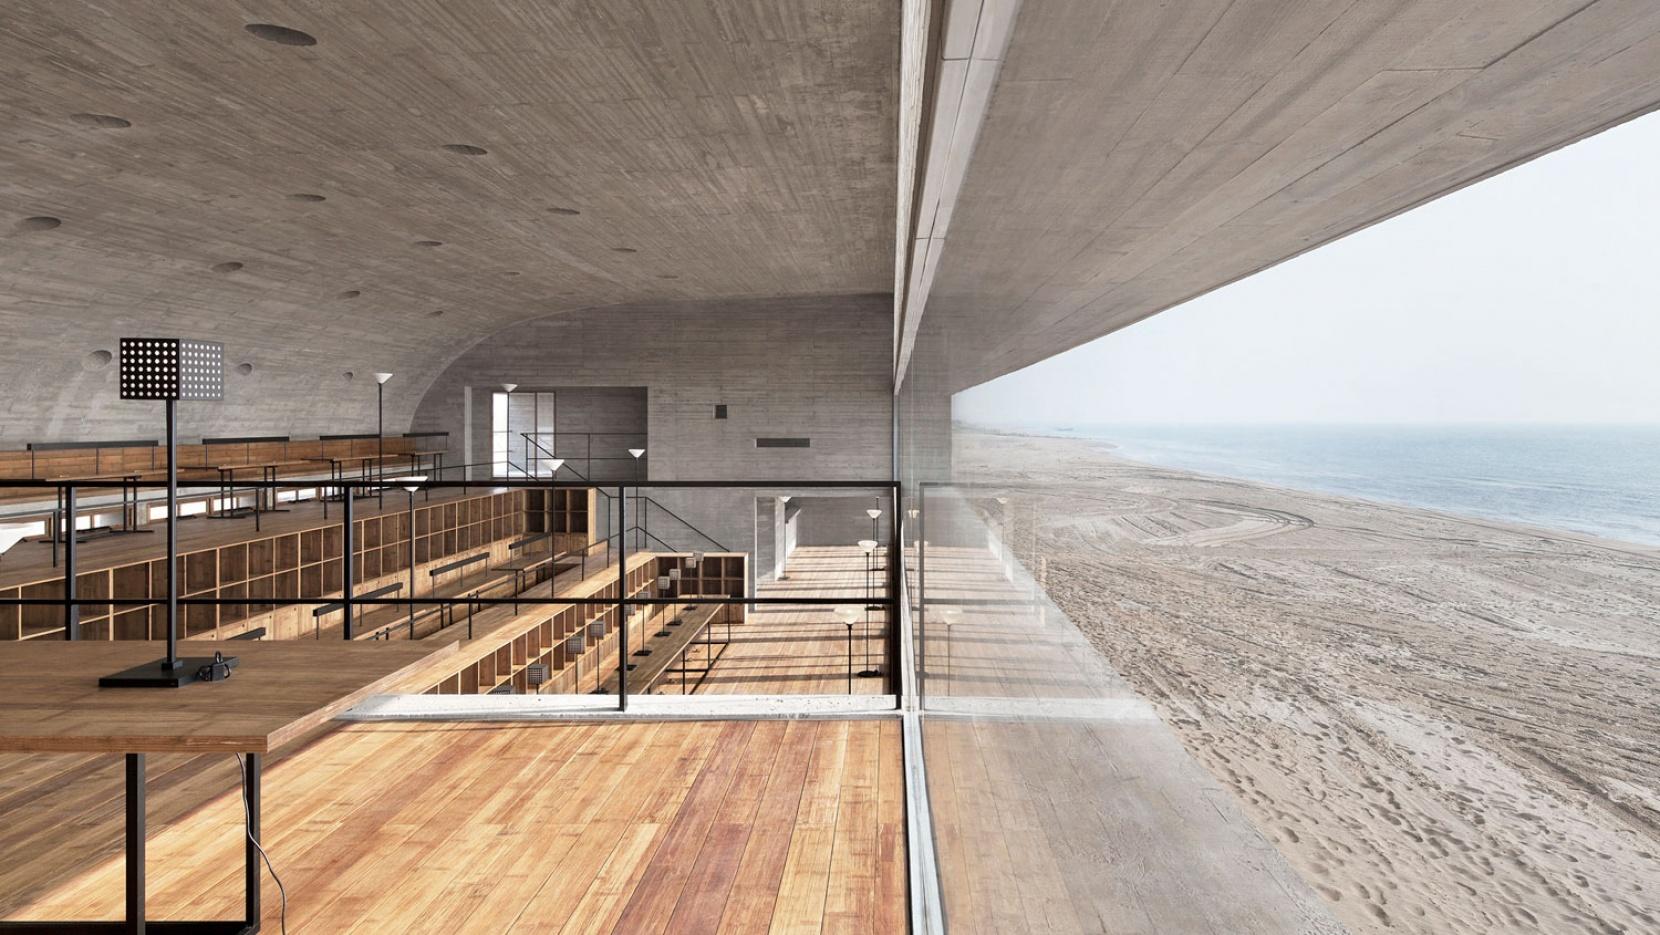 p5_seashore_library_qinhuangdao_vector_architects_yatzer.jpg